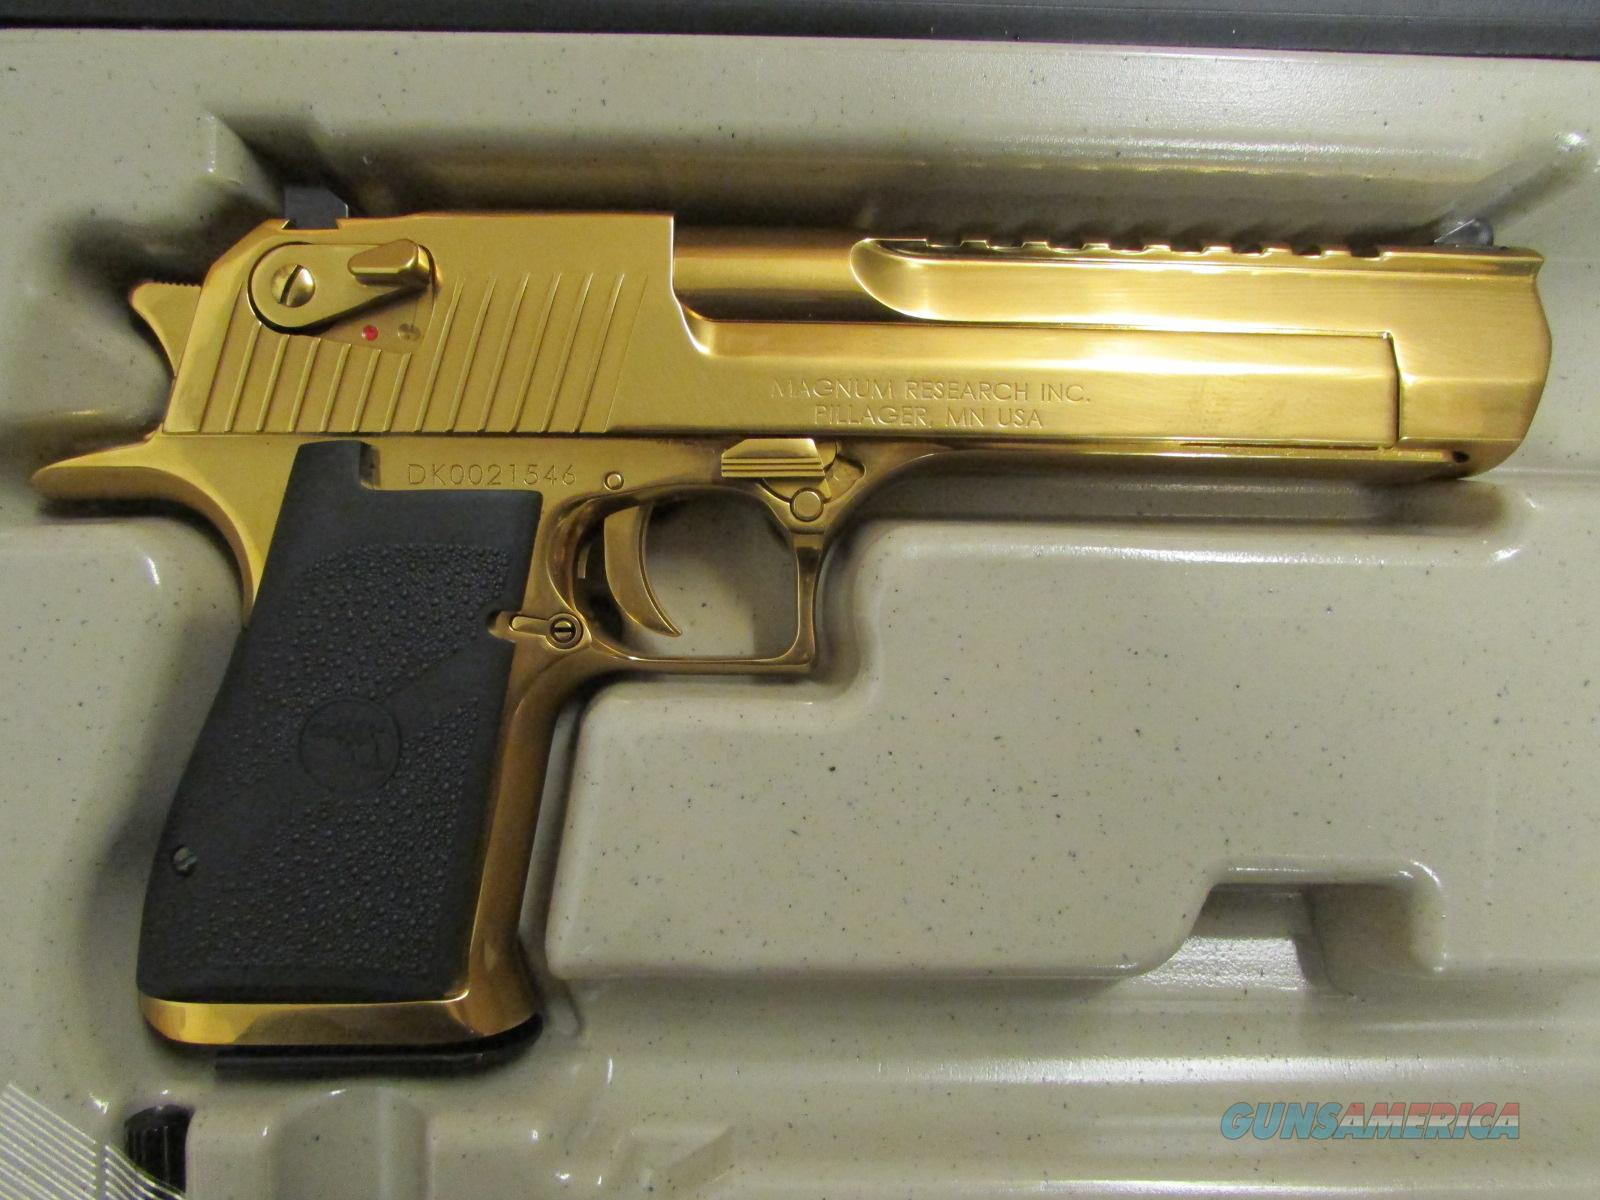 Titanium Gold Magnum Research Desert Eagle Mark... for sale